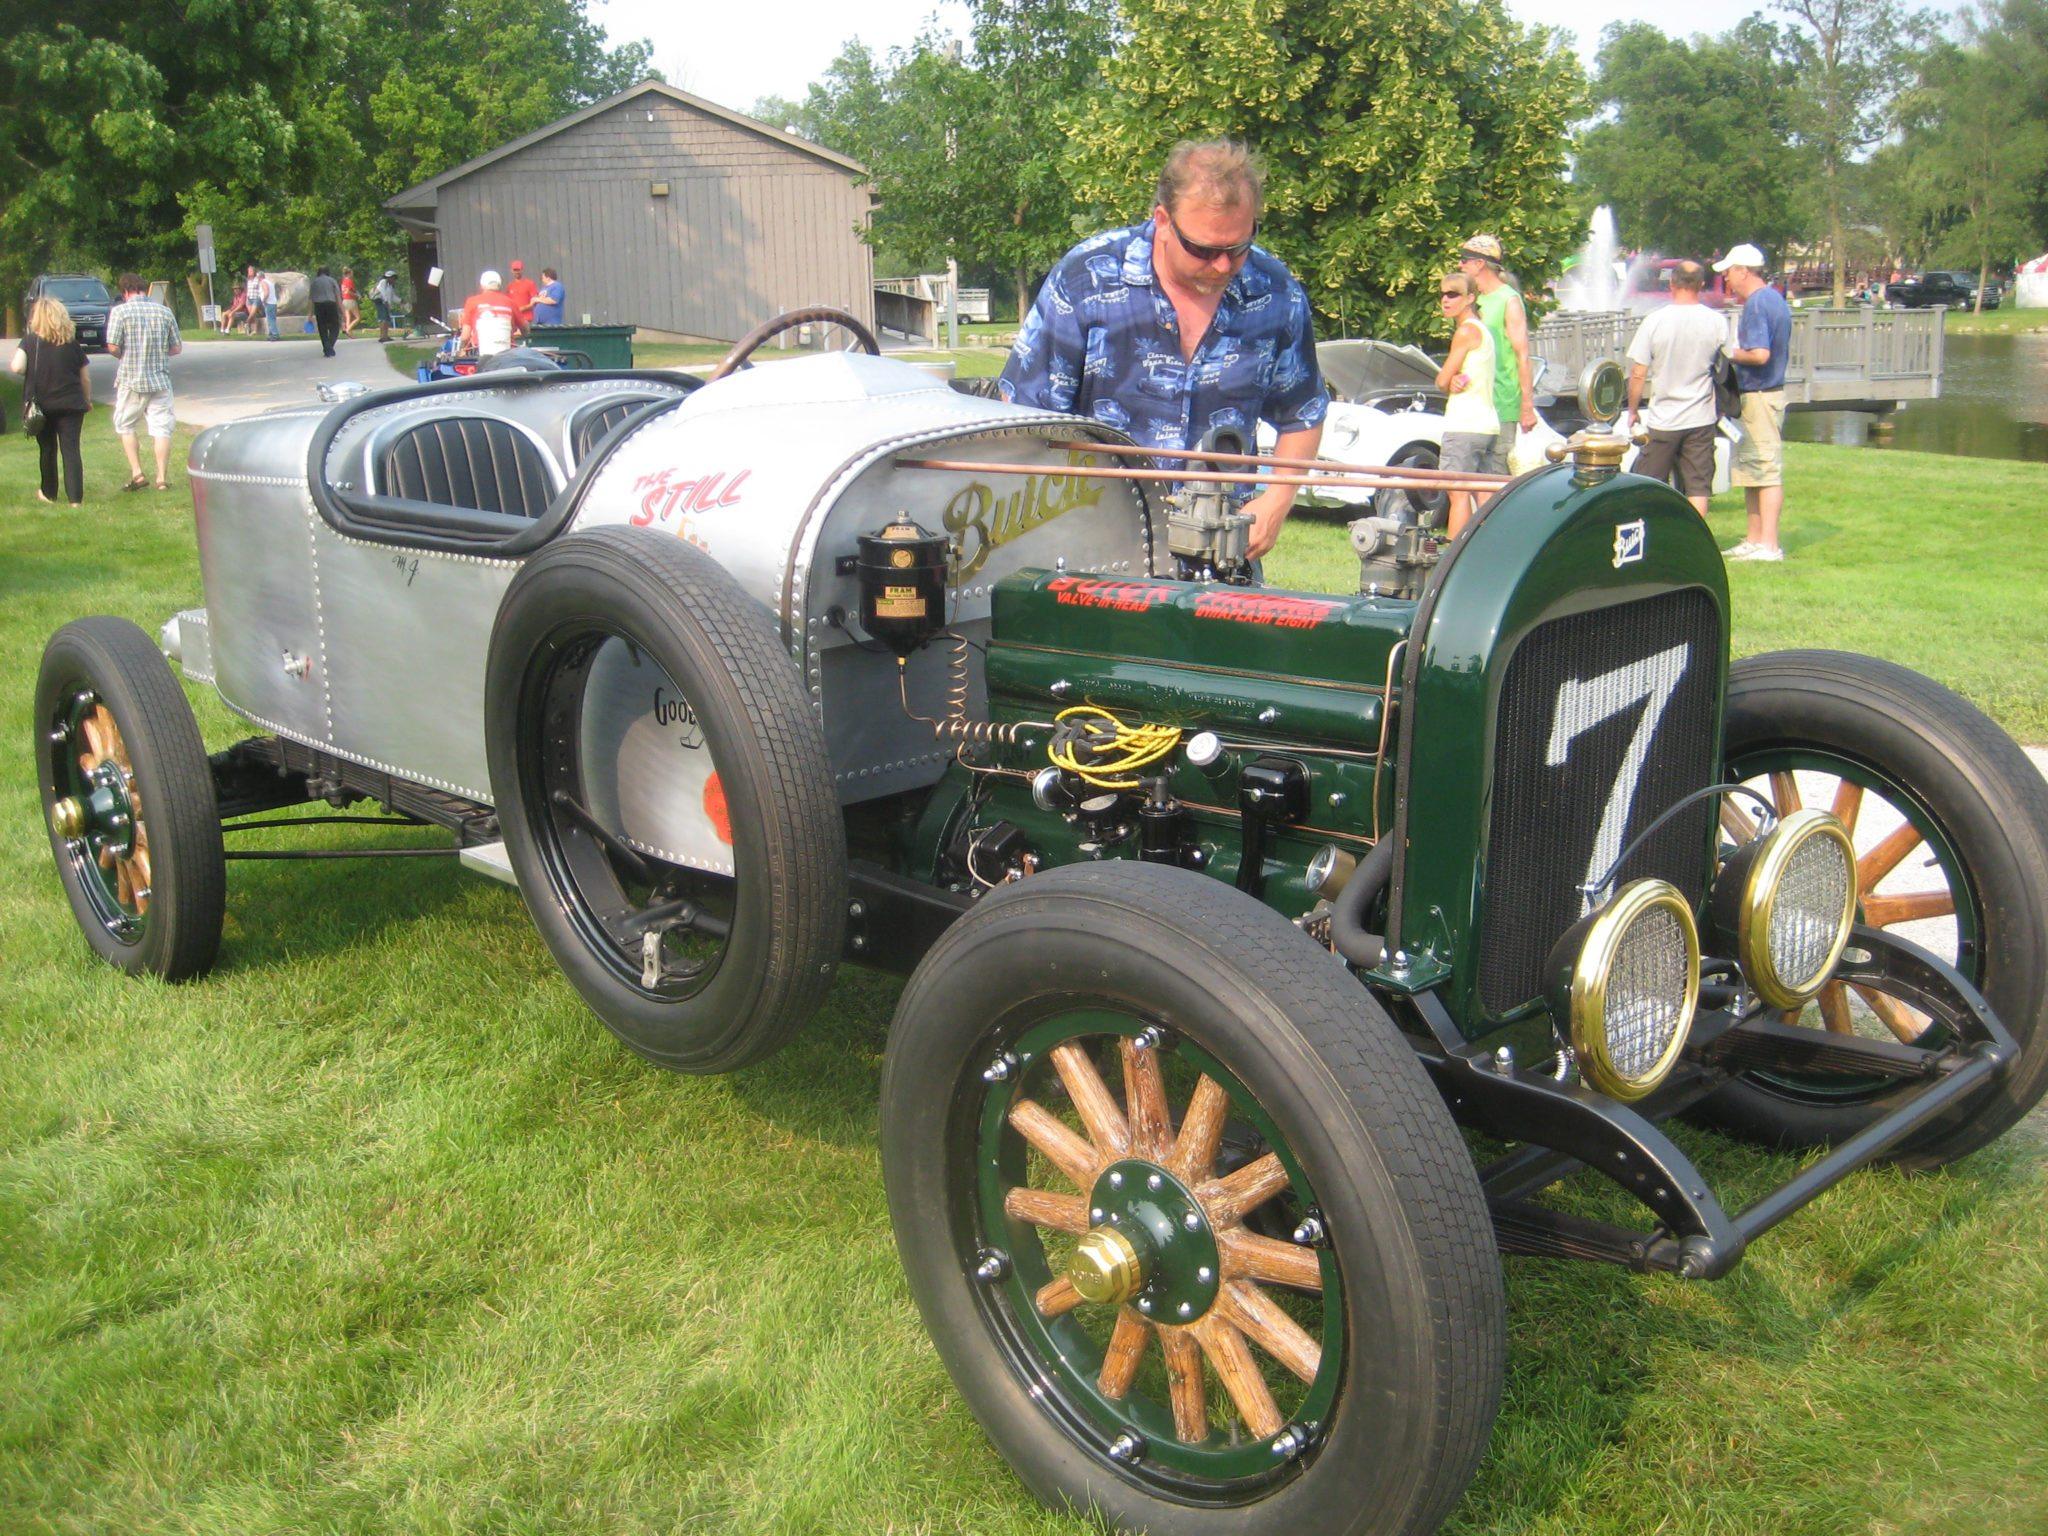 Ducktona Family Festival Visit Sheboygan County - Wisconsin classic car show calendar